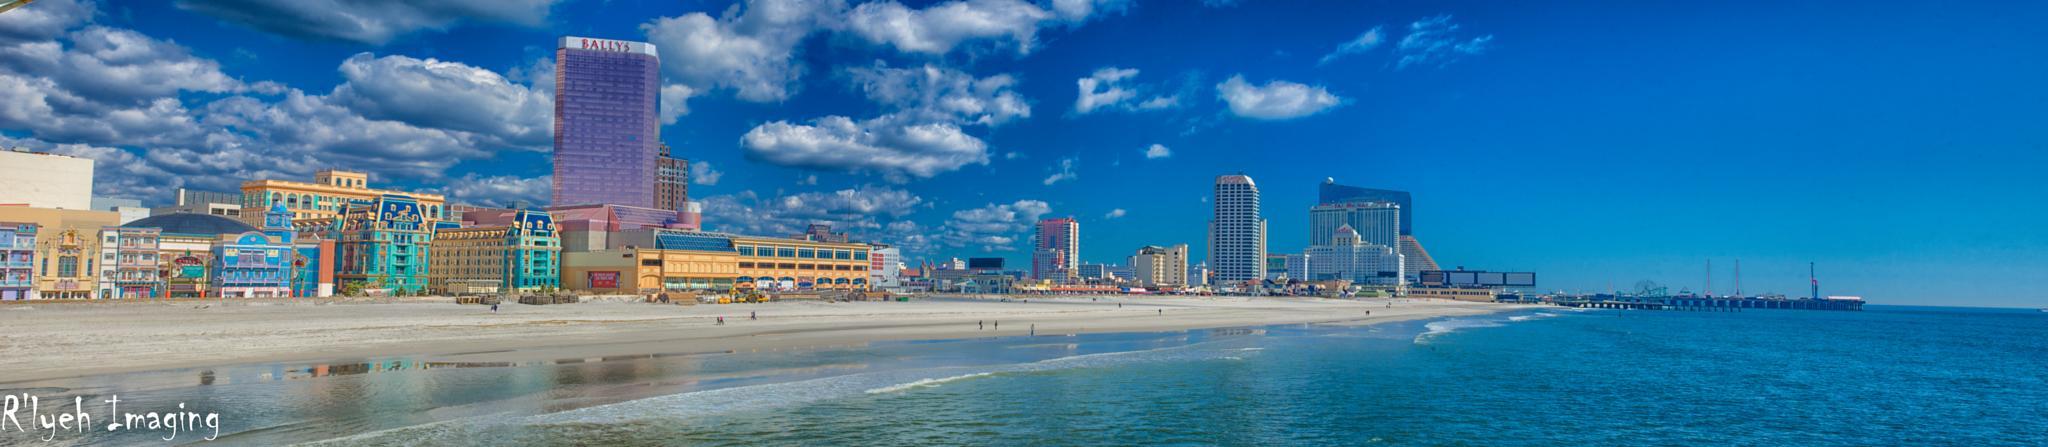 Atlantic City by R'Lyeh Imaging